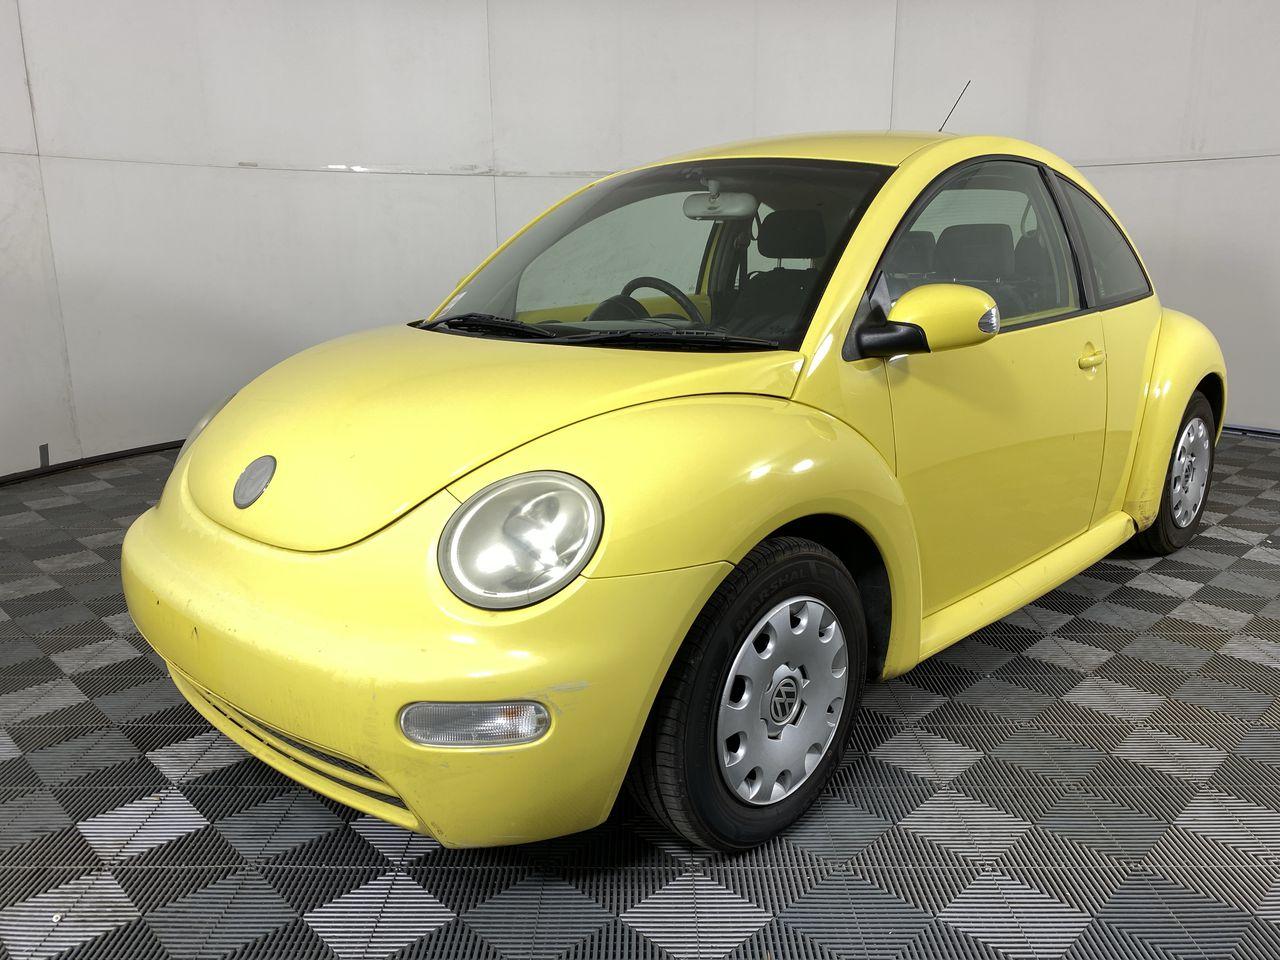 2004 Volkswagen Beetle 1.6 IKON A4 Automatic Hatchback